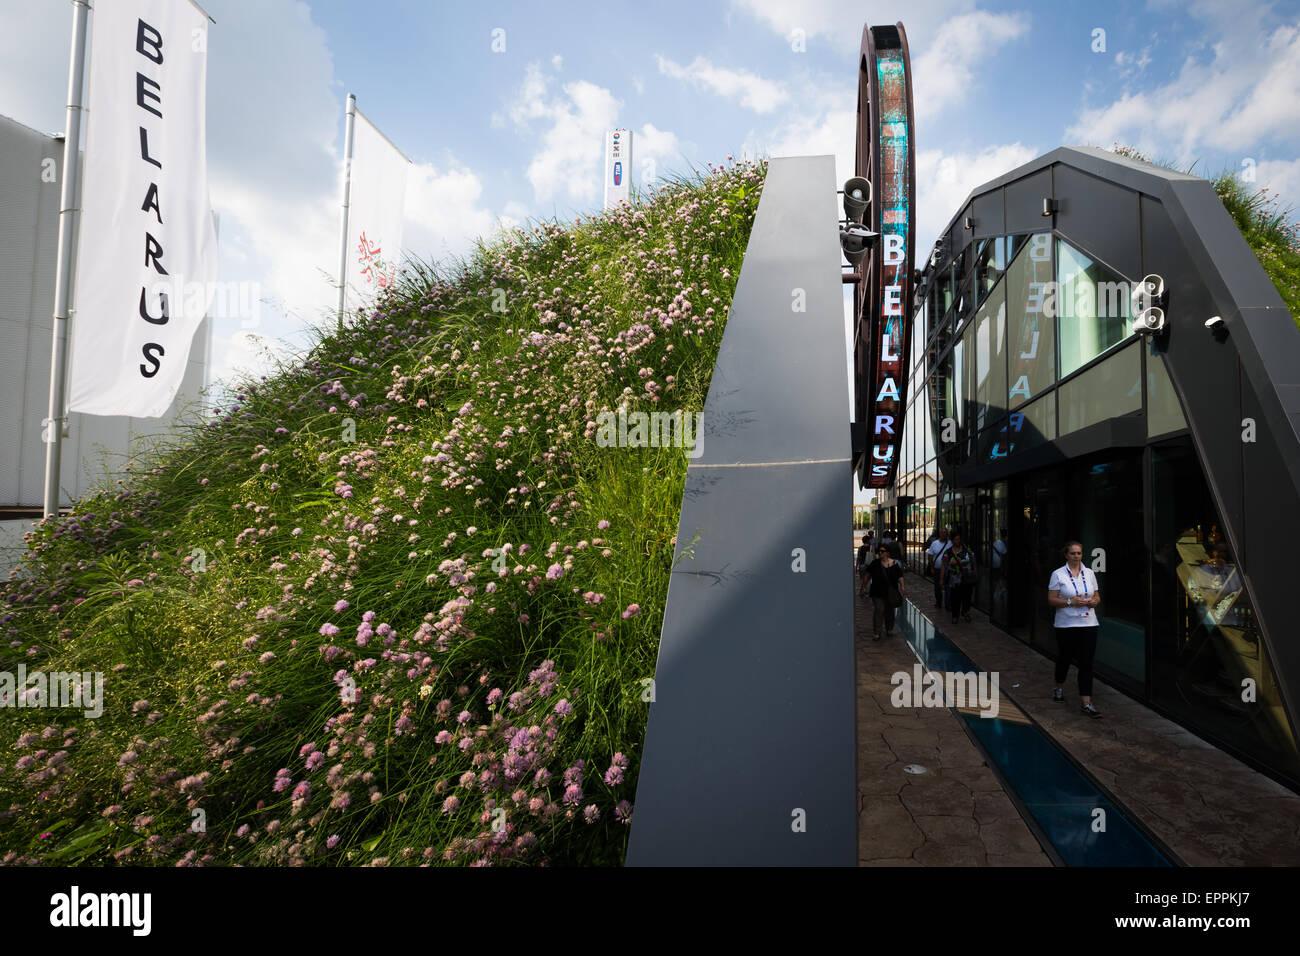 Expo 2015 Milan - Stock Image